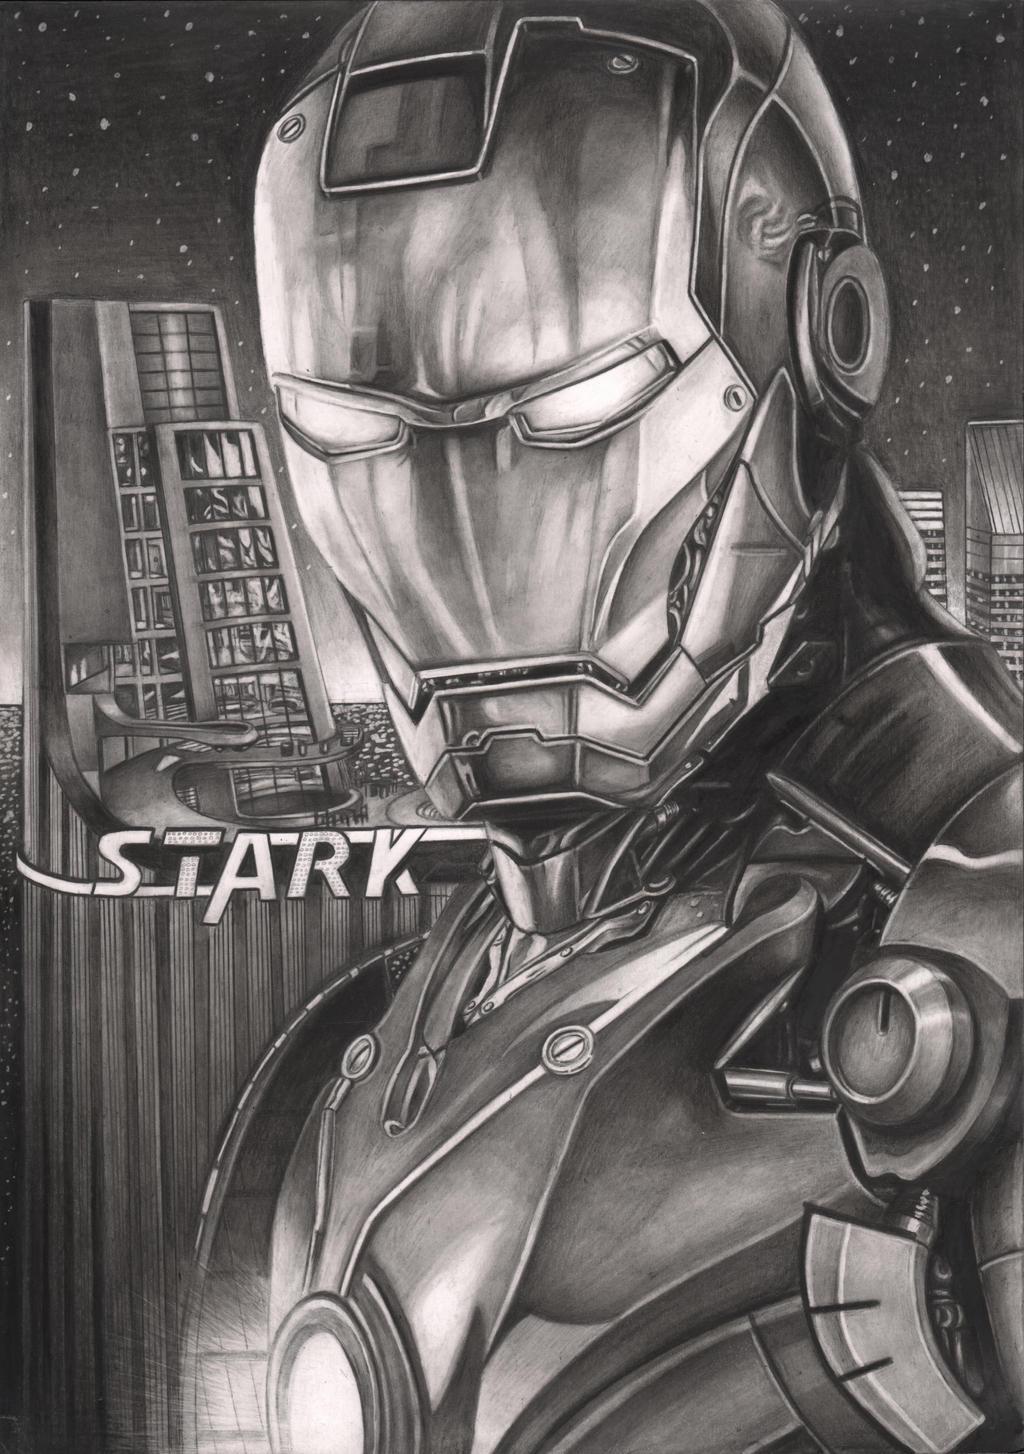 iron man graphite drawing by pen tacular artist on deviantart